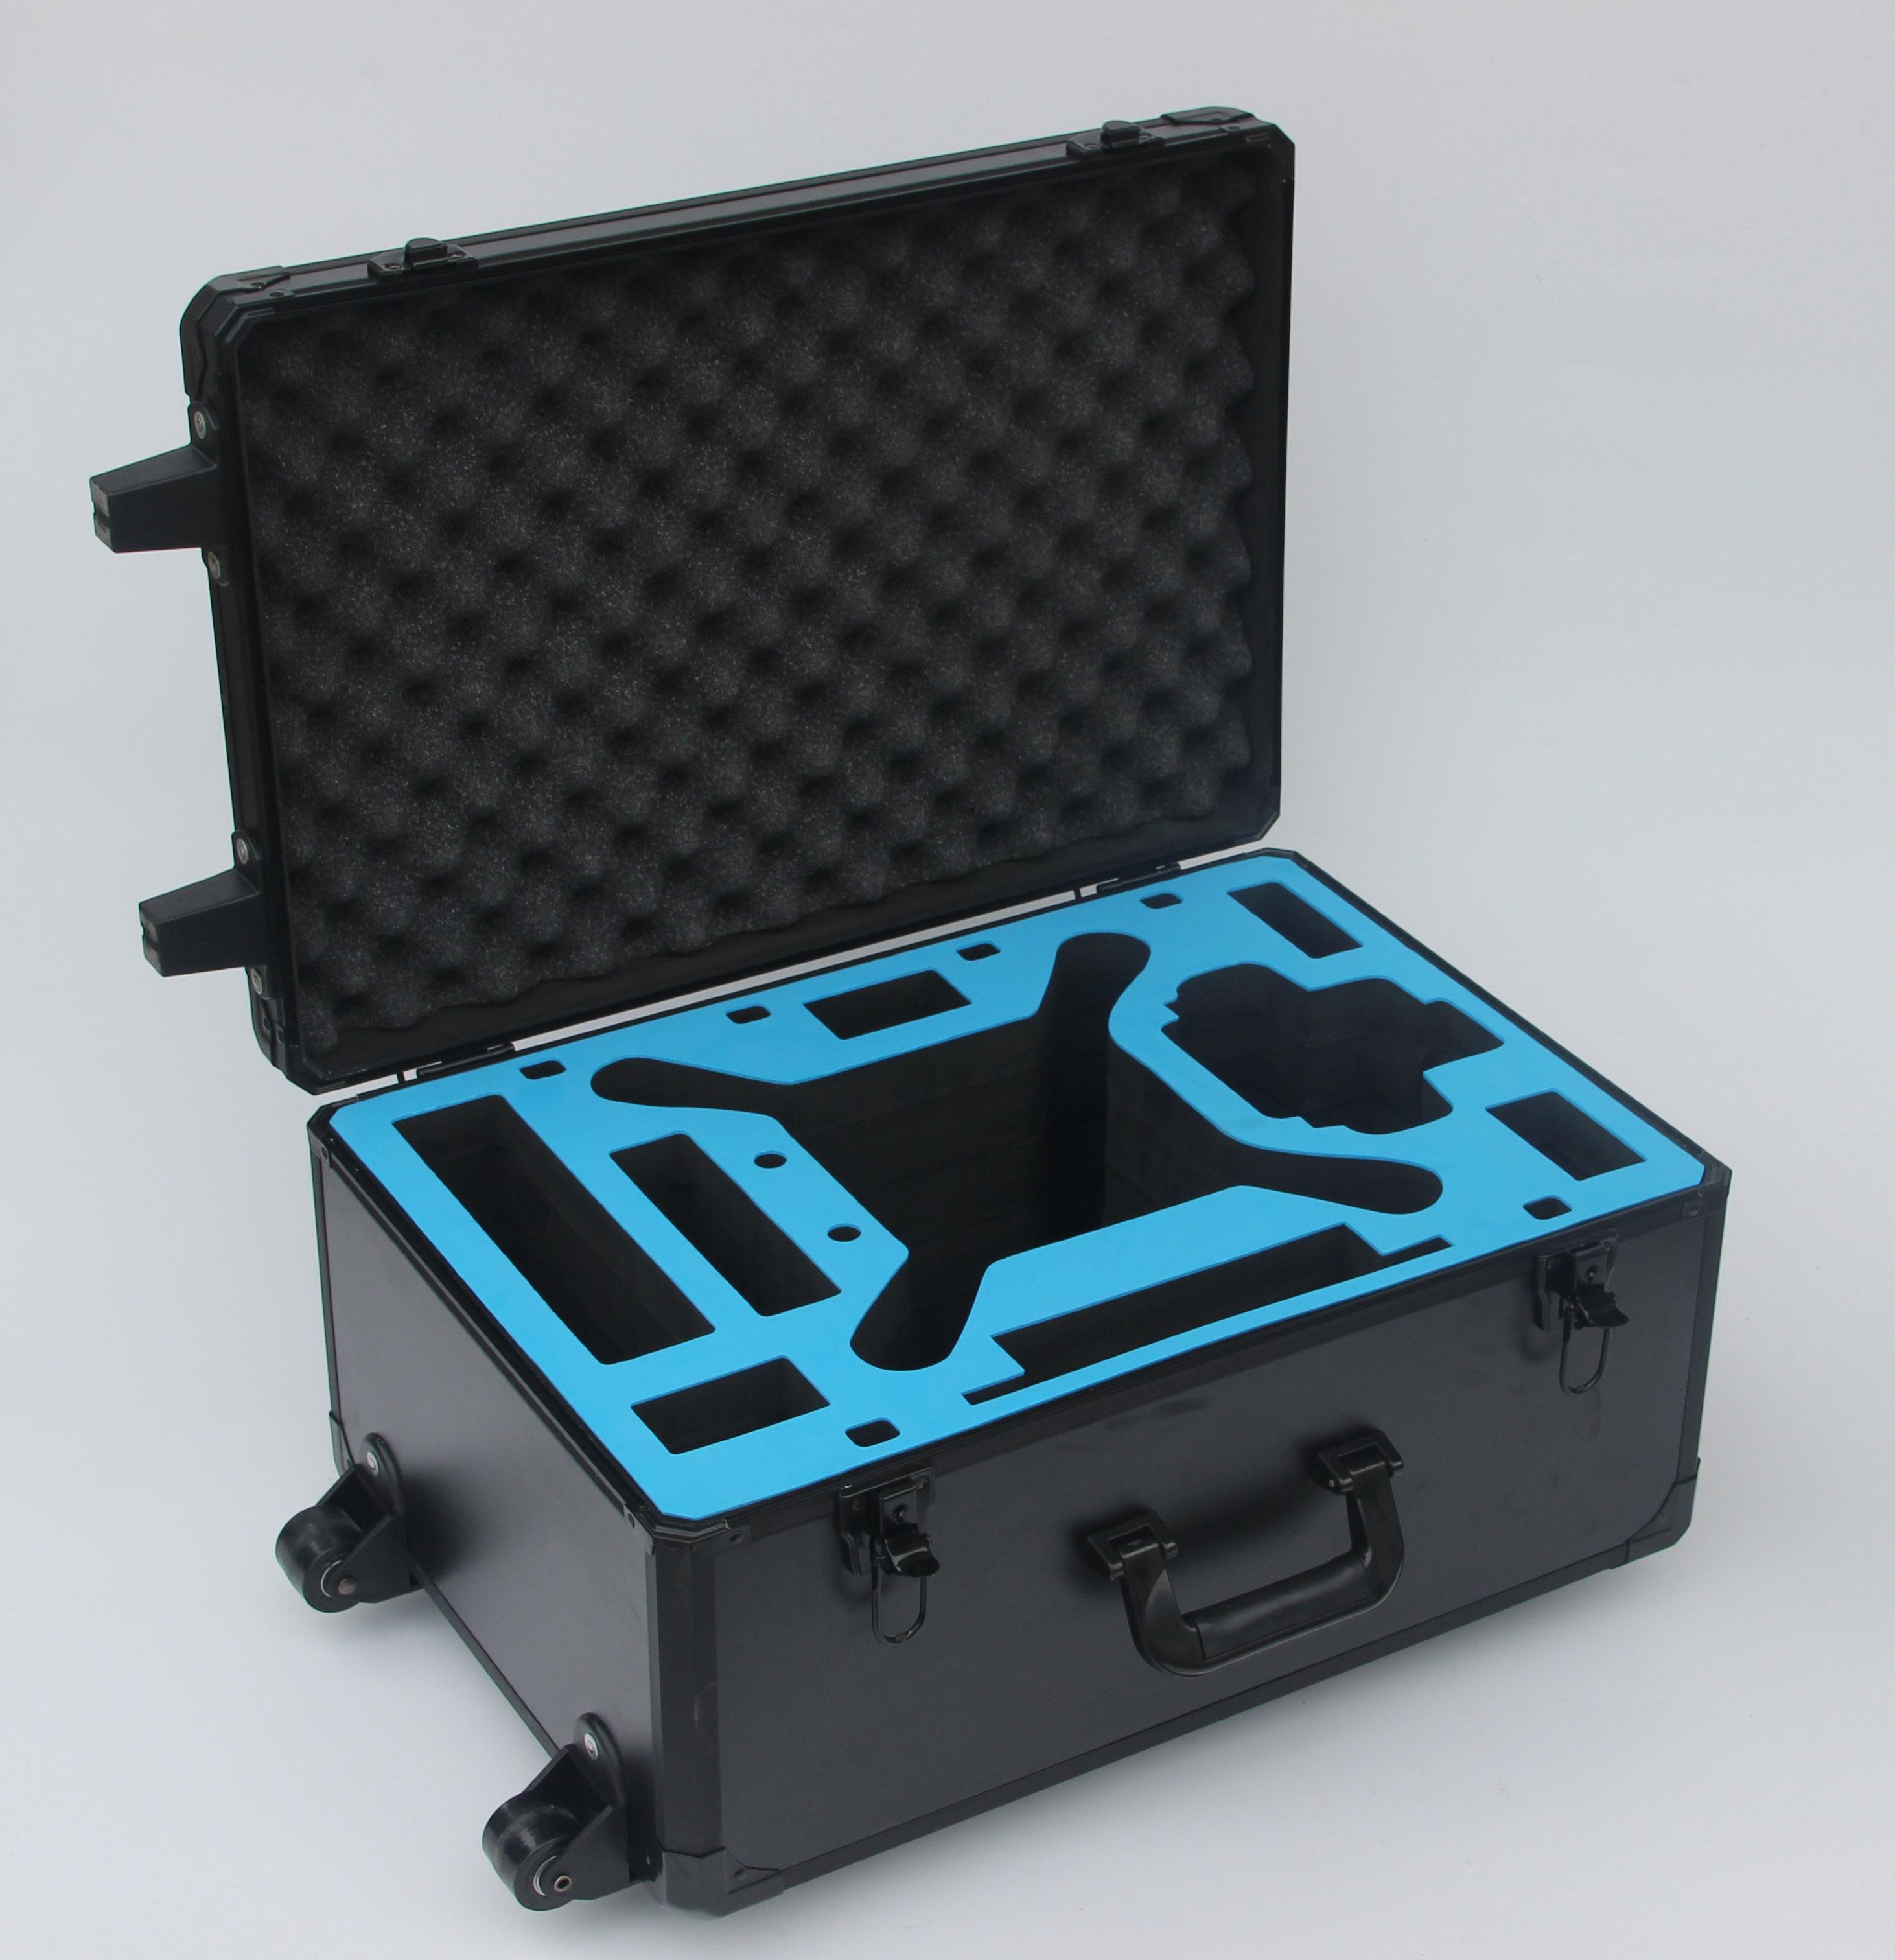 Black Trolley DJI Phantom 3 Aluminum Hard Foam Storage Case With Wheels